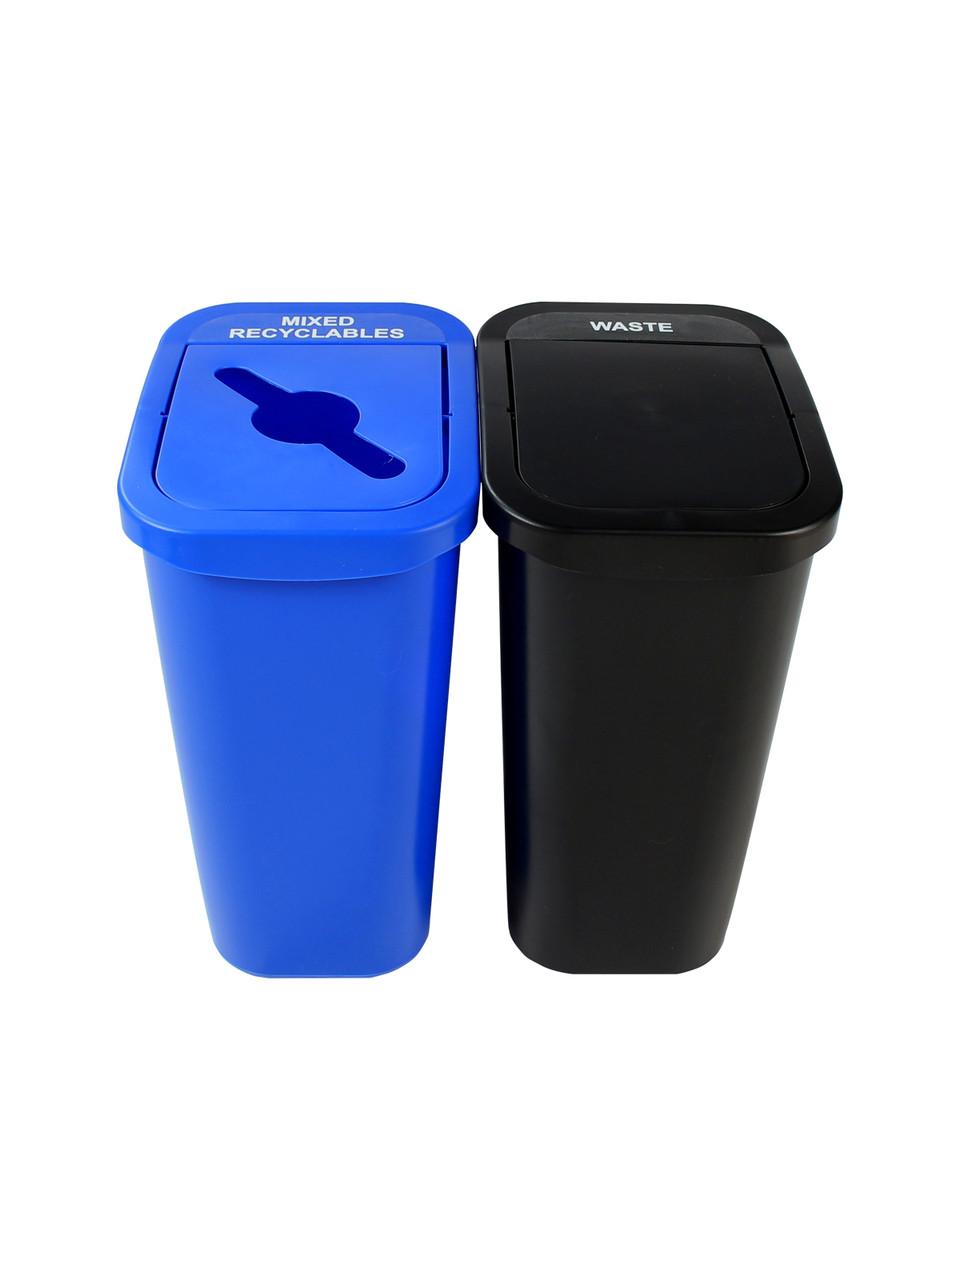 20 Gallon Billi Box Double Trash Can Recycle Bin Combo 8102021-24 (Mixed, Swing Openings)